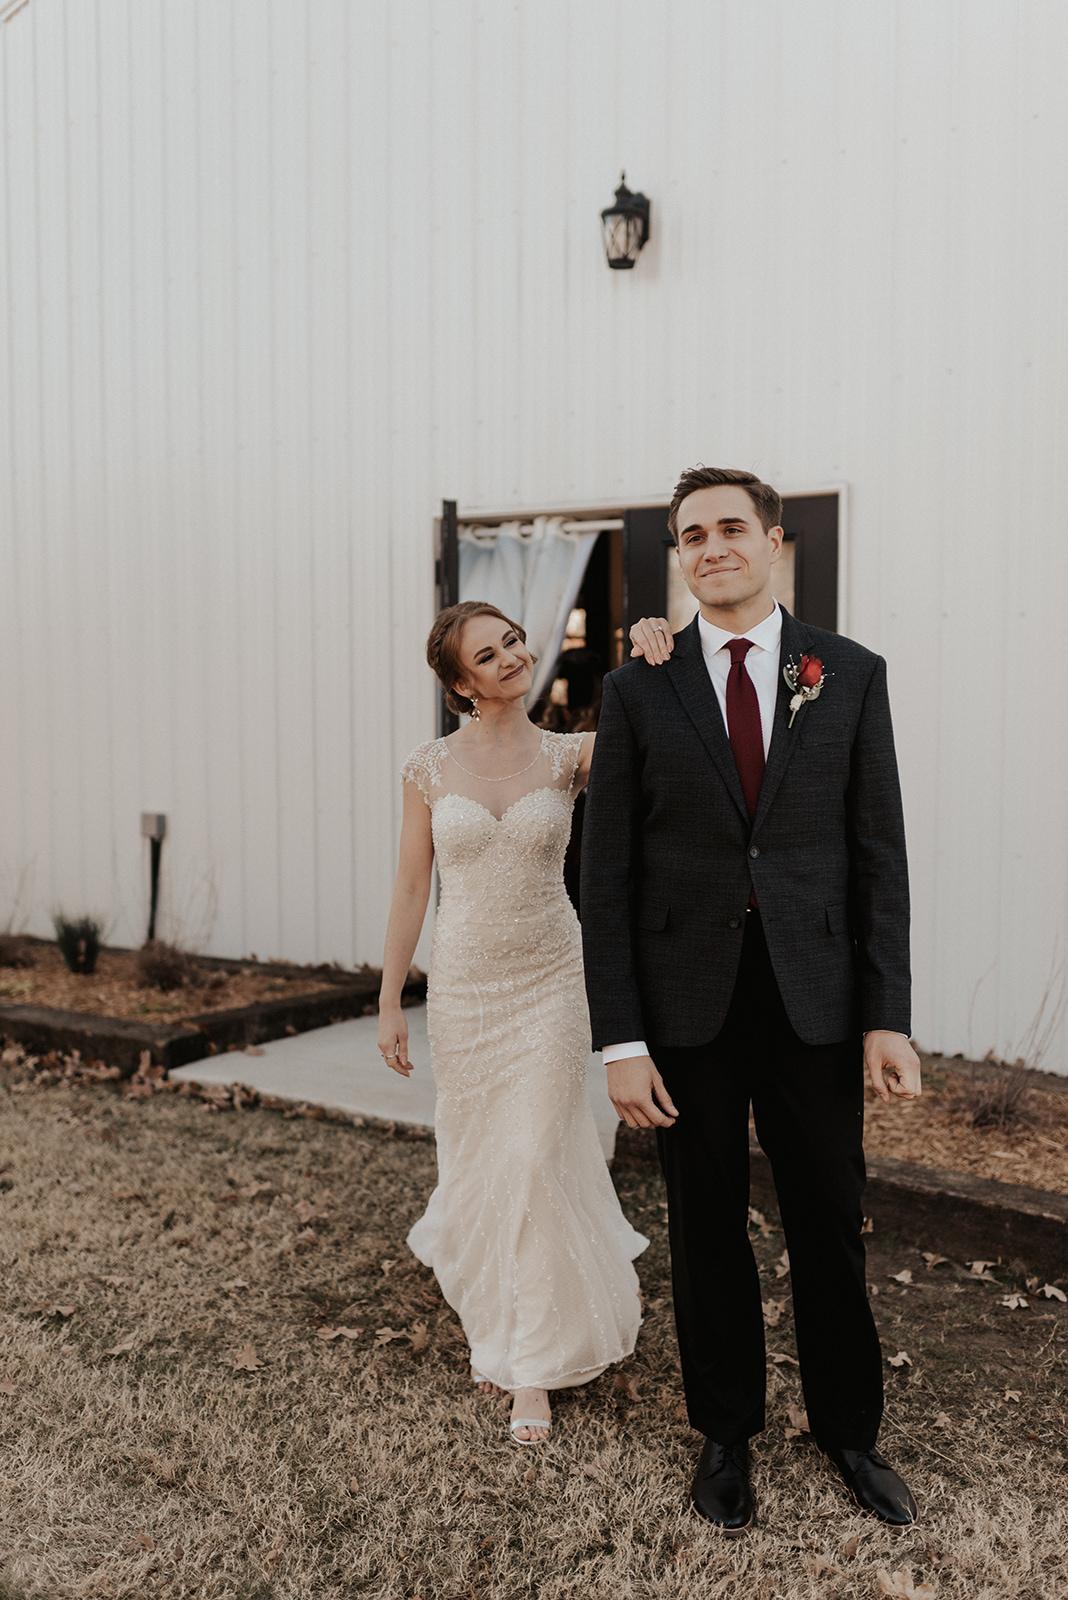 Best Wedding Venue in Tulsa Bixby Dream Point Ranch 14.jpg